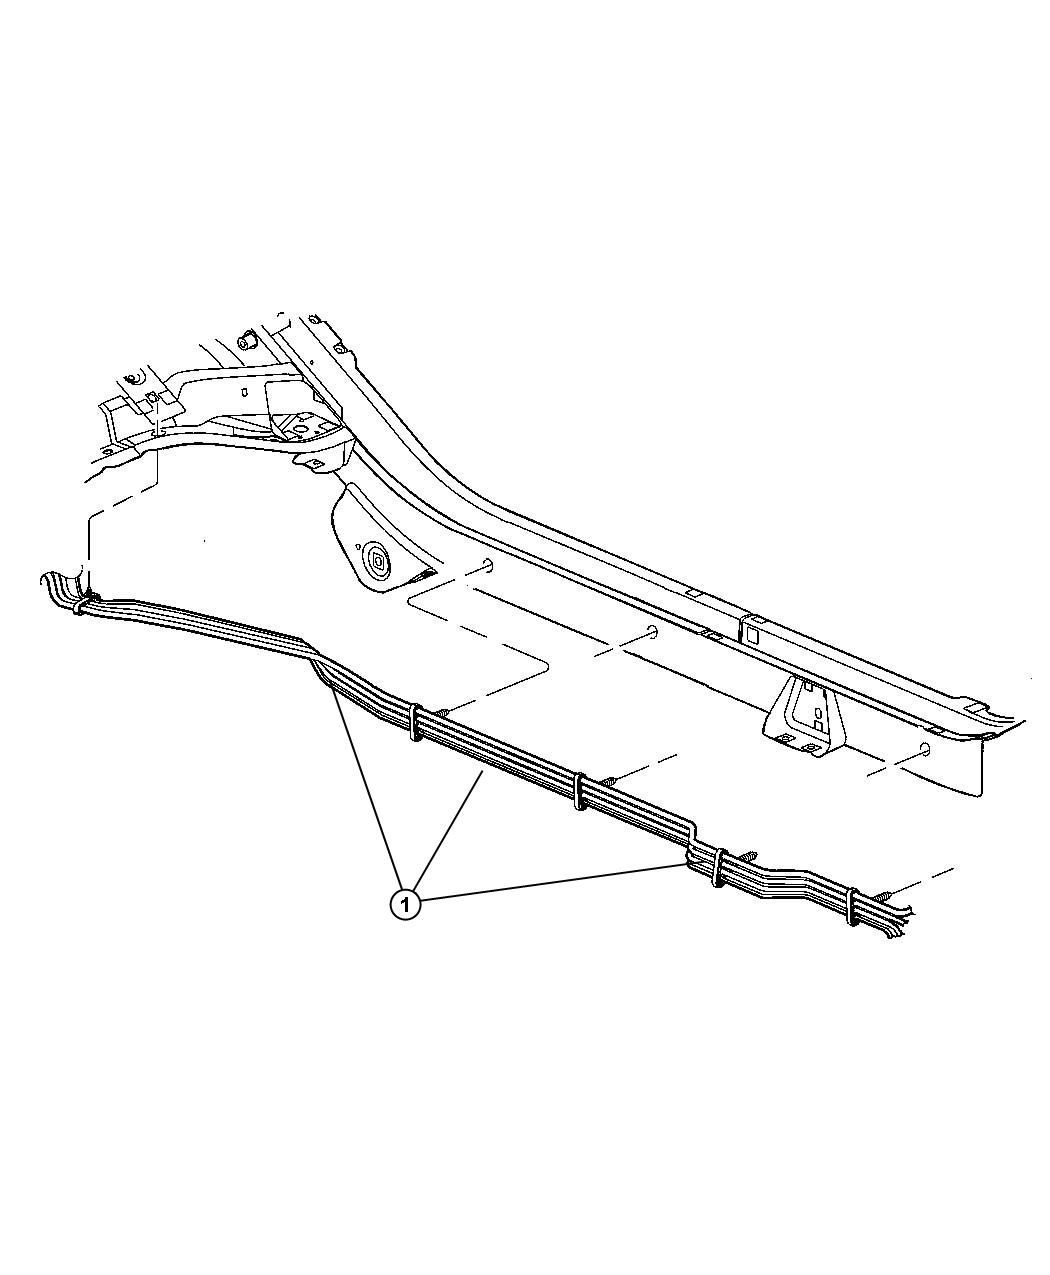 tags: #05 jeep wrangler vacuum line diagram#2002 jeep wrangler vacuum  lines#91 jeep wrangler vacuum diagram#2002 jeep wrangler engine diagram#94  jeep